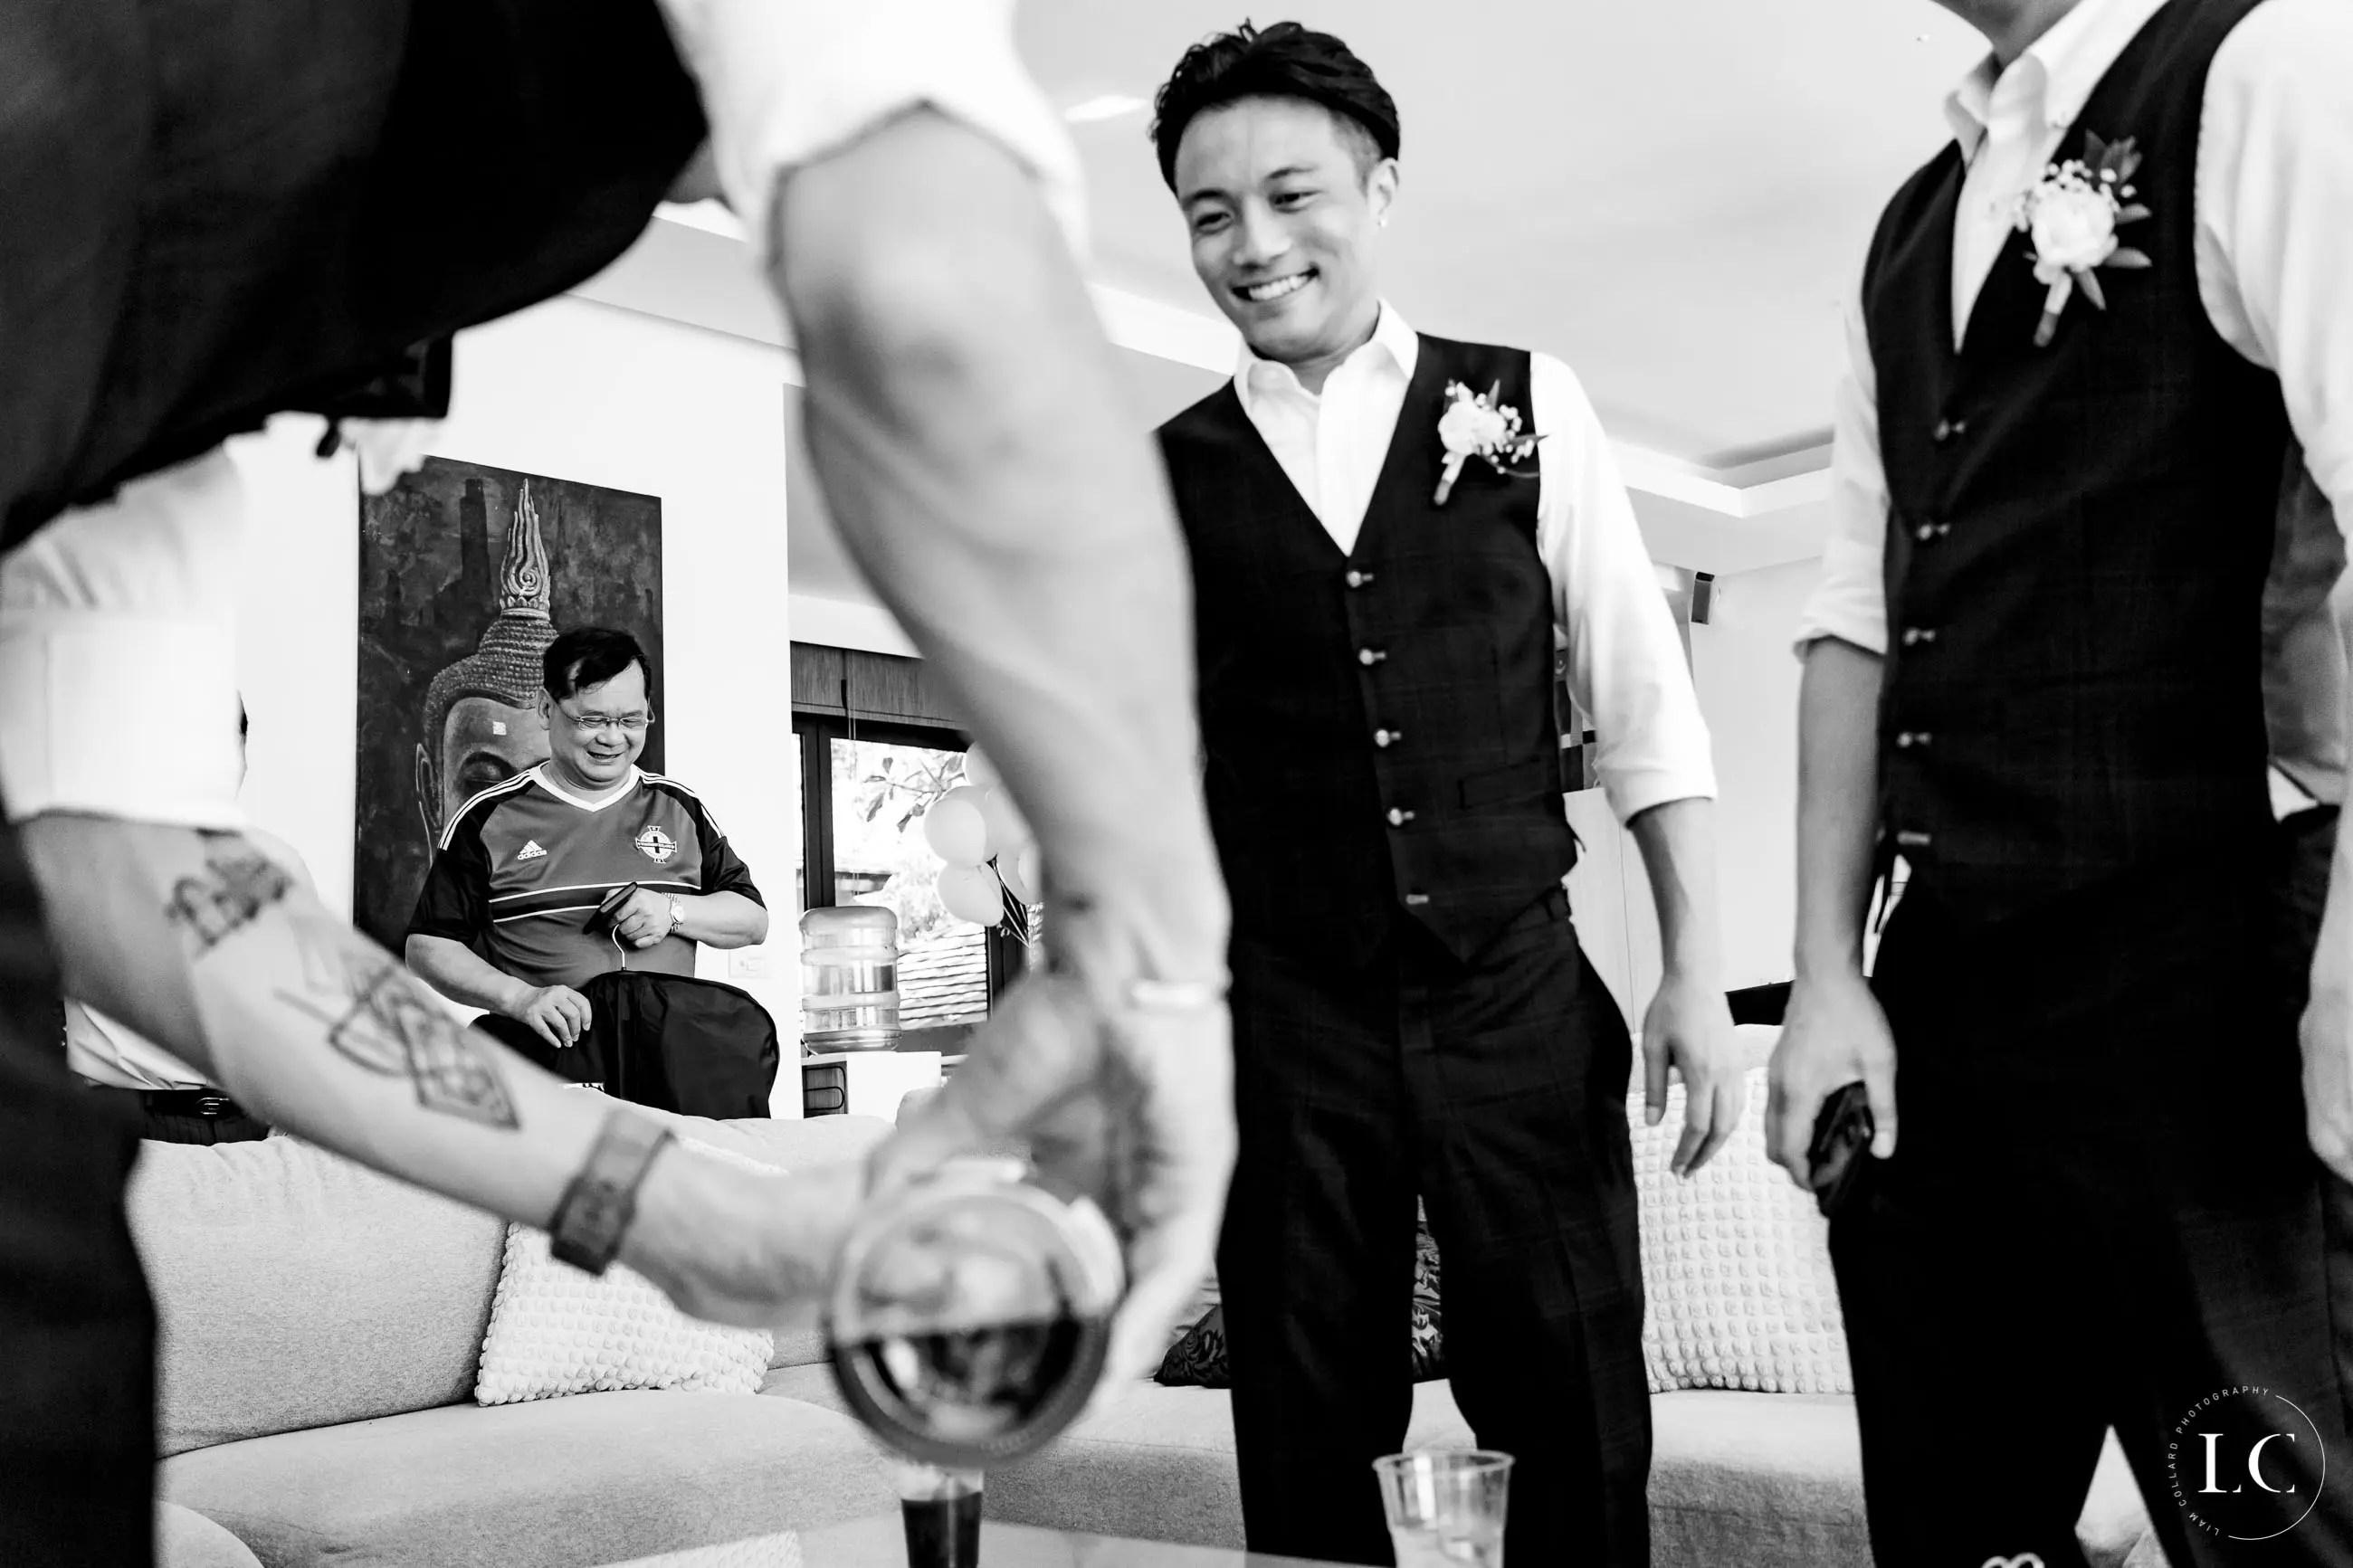 Groomsmen at a wedding